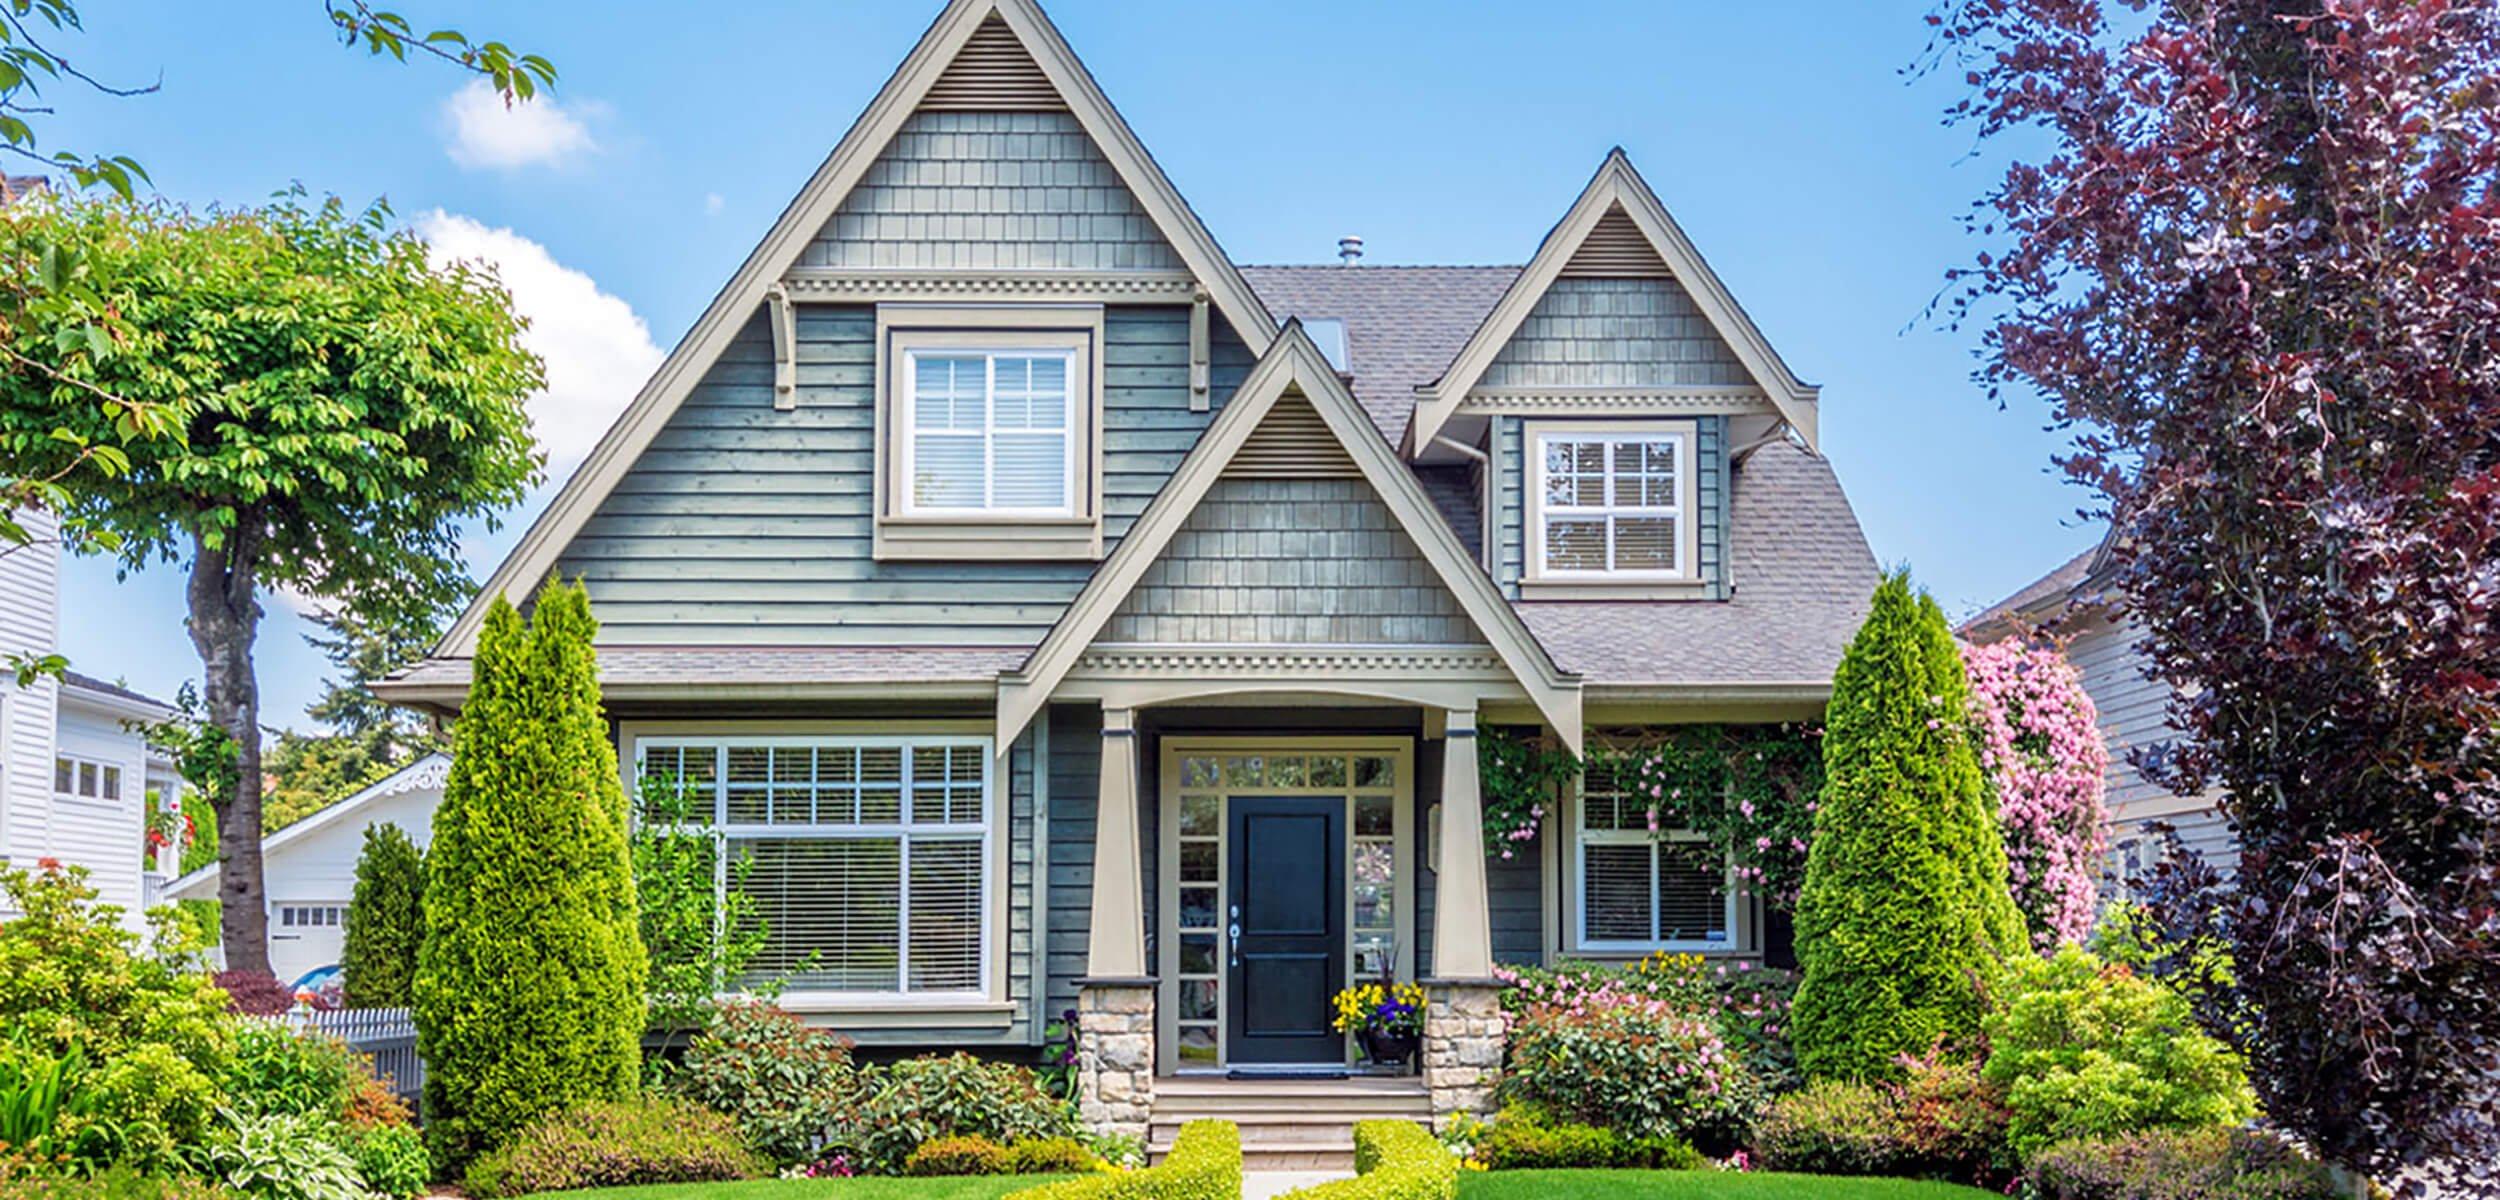 Find your dream home in Woodstock Ontario